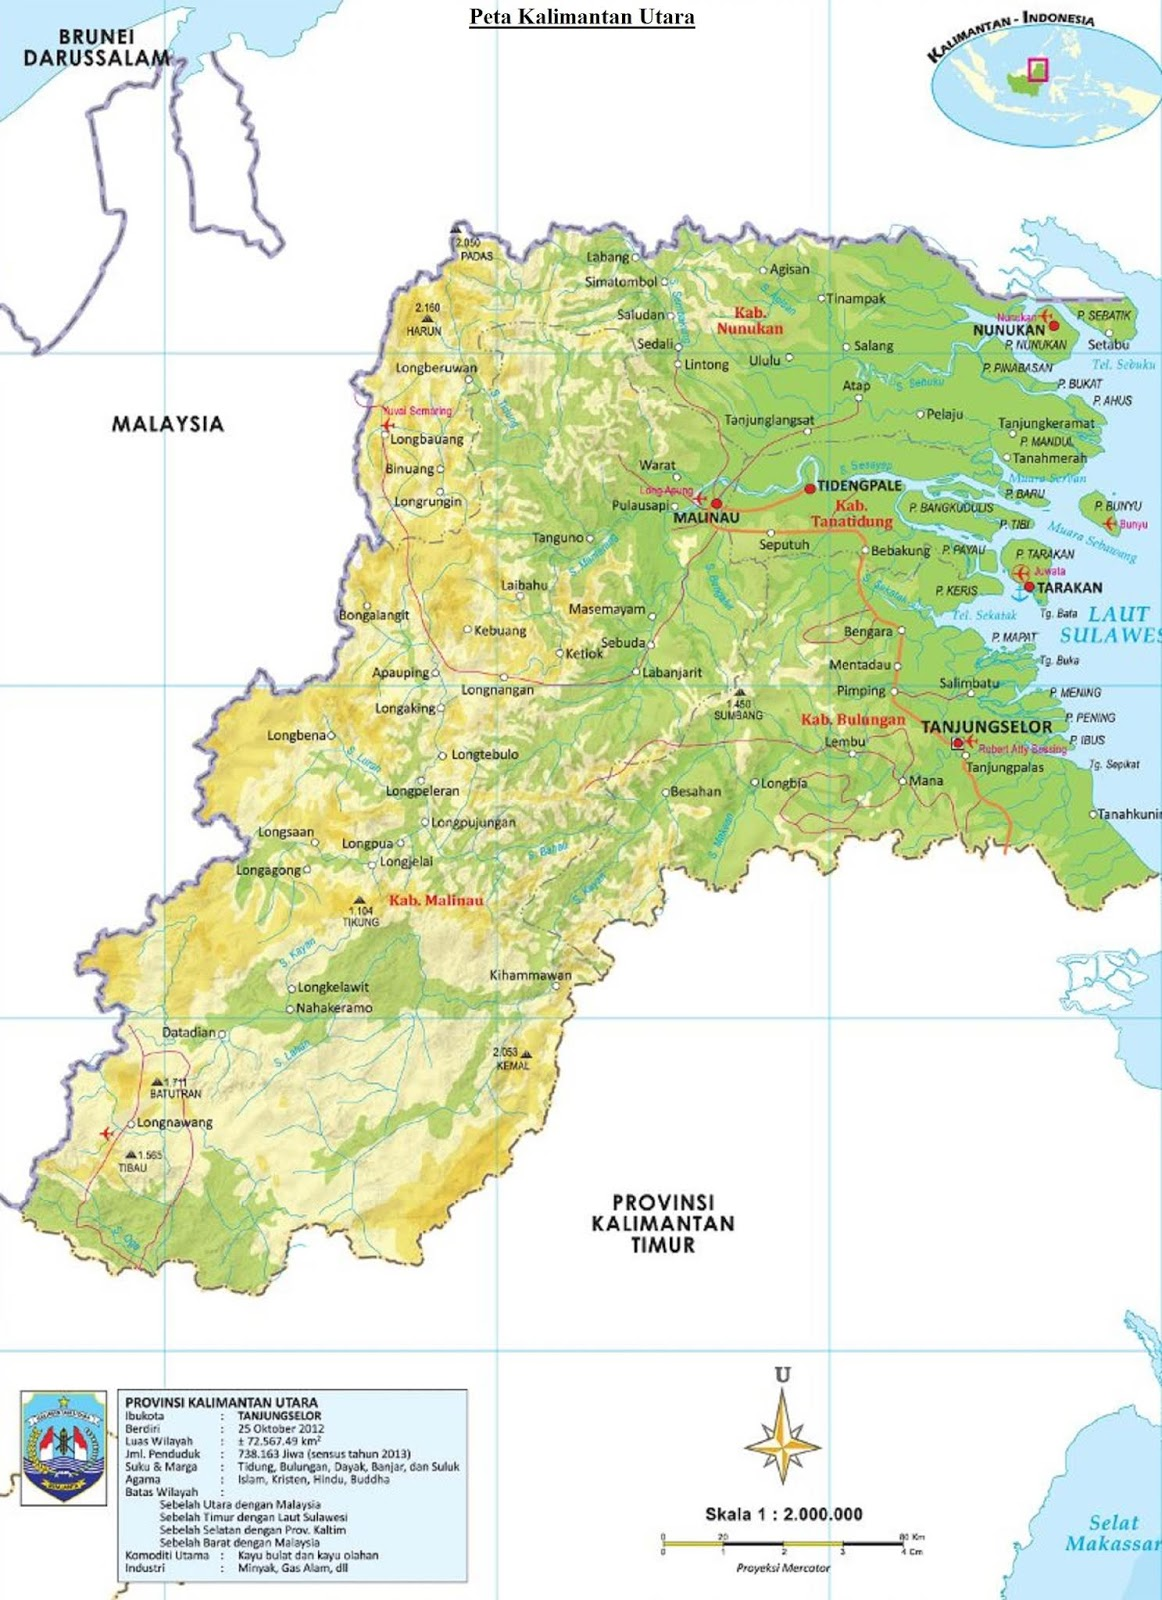 Peta Kalimantan Utara HD